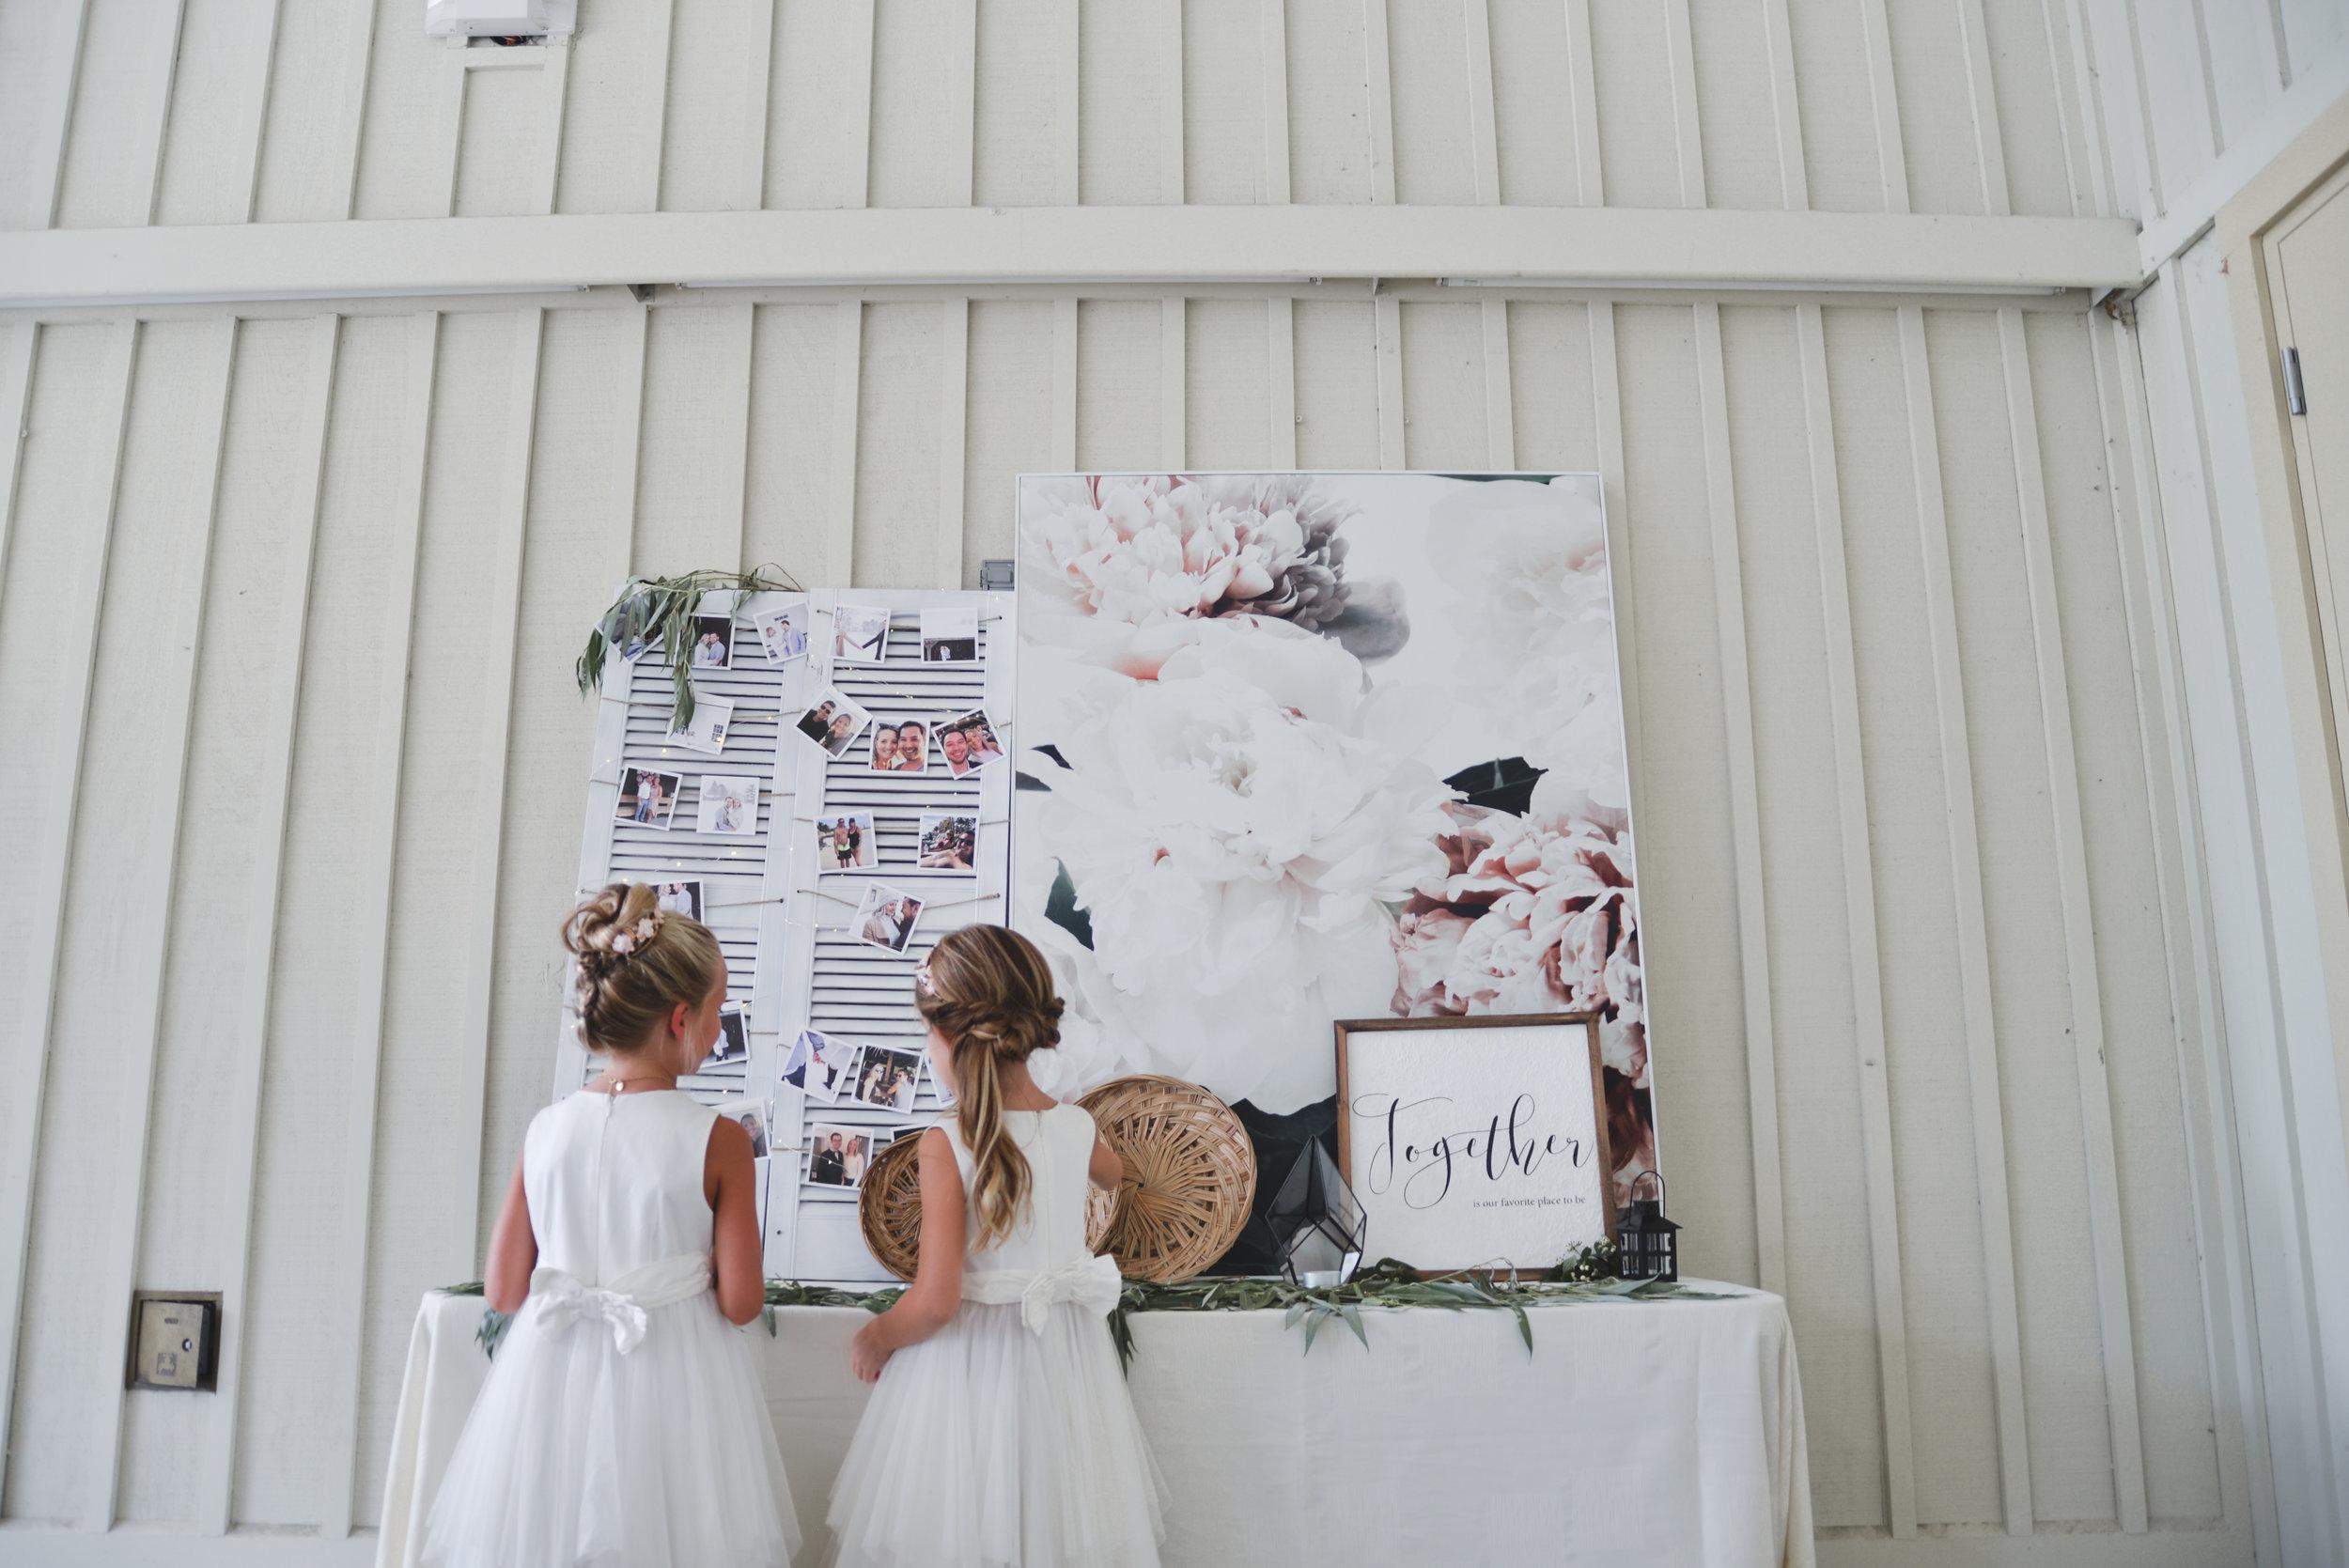 Black creek pioneer village  wedding reception (3).jpg